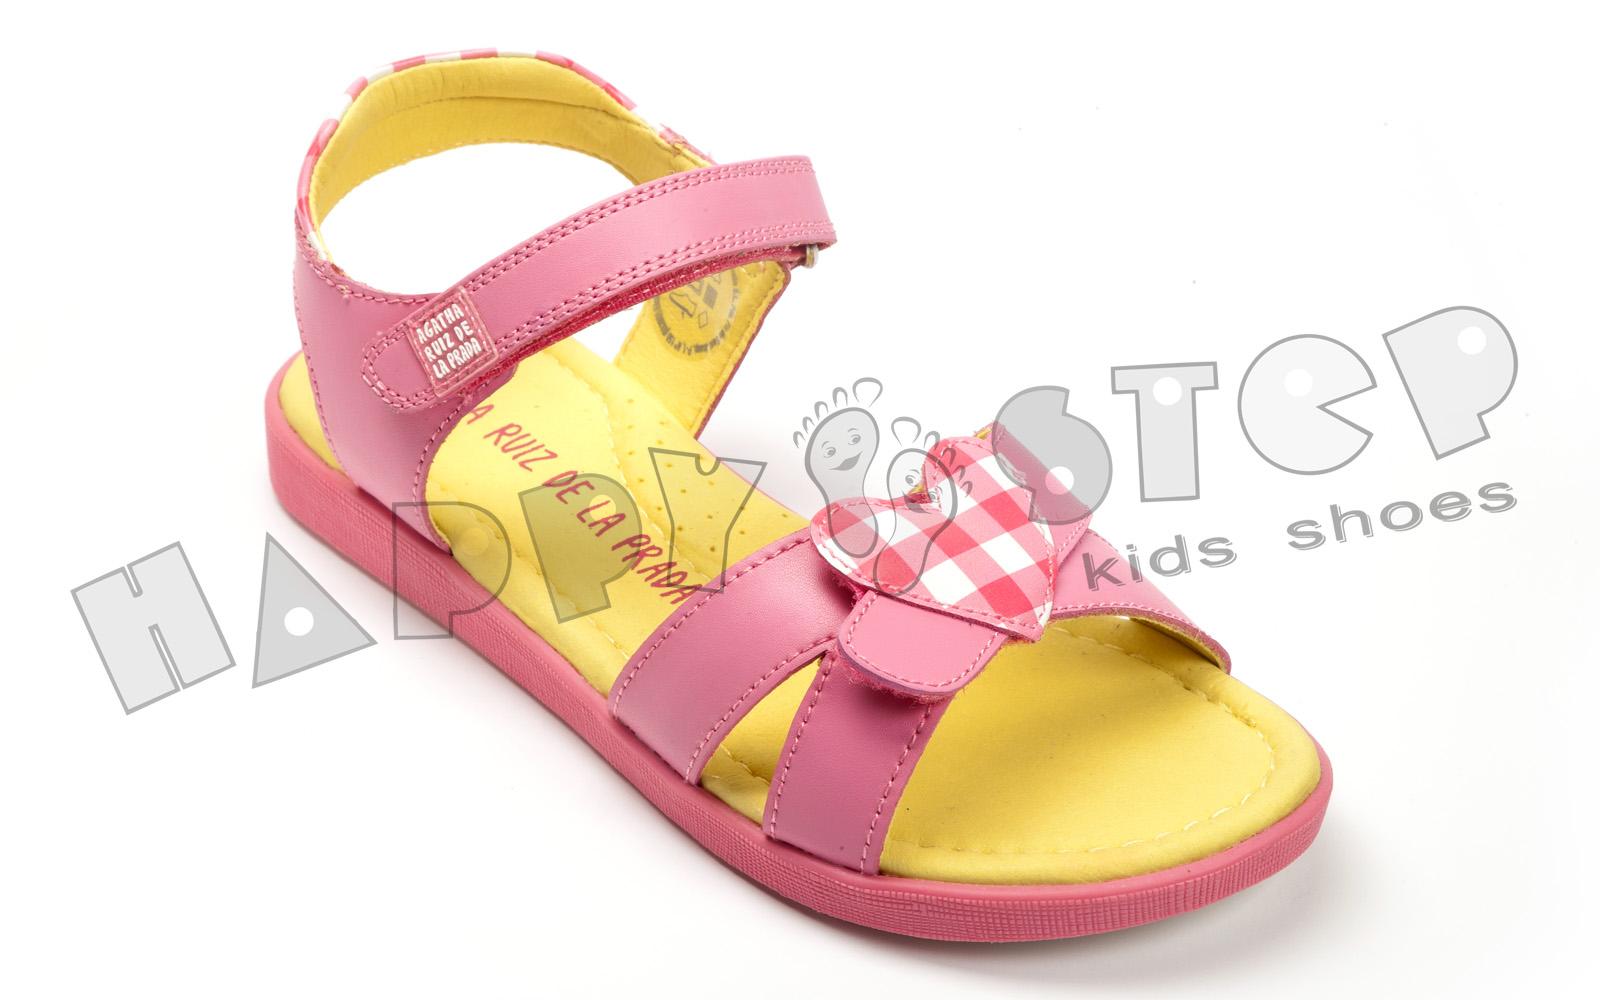 456f53acd42 AGATHA RUIZ DE LA PRADA 192935 - Παιδικά παπούτσια Happy Step